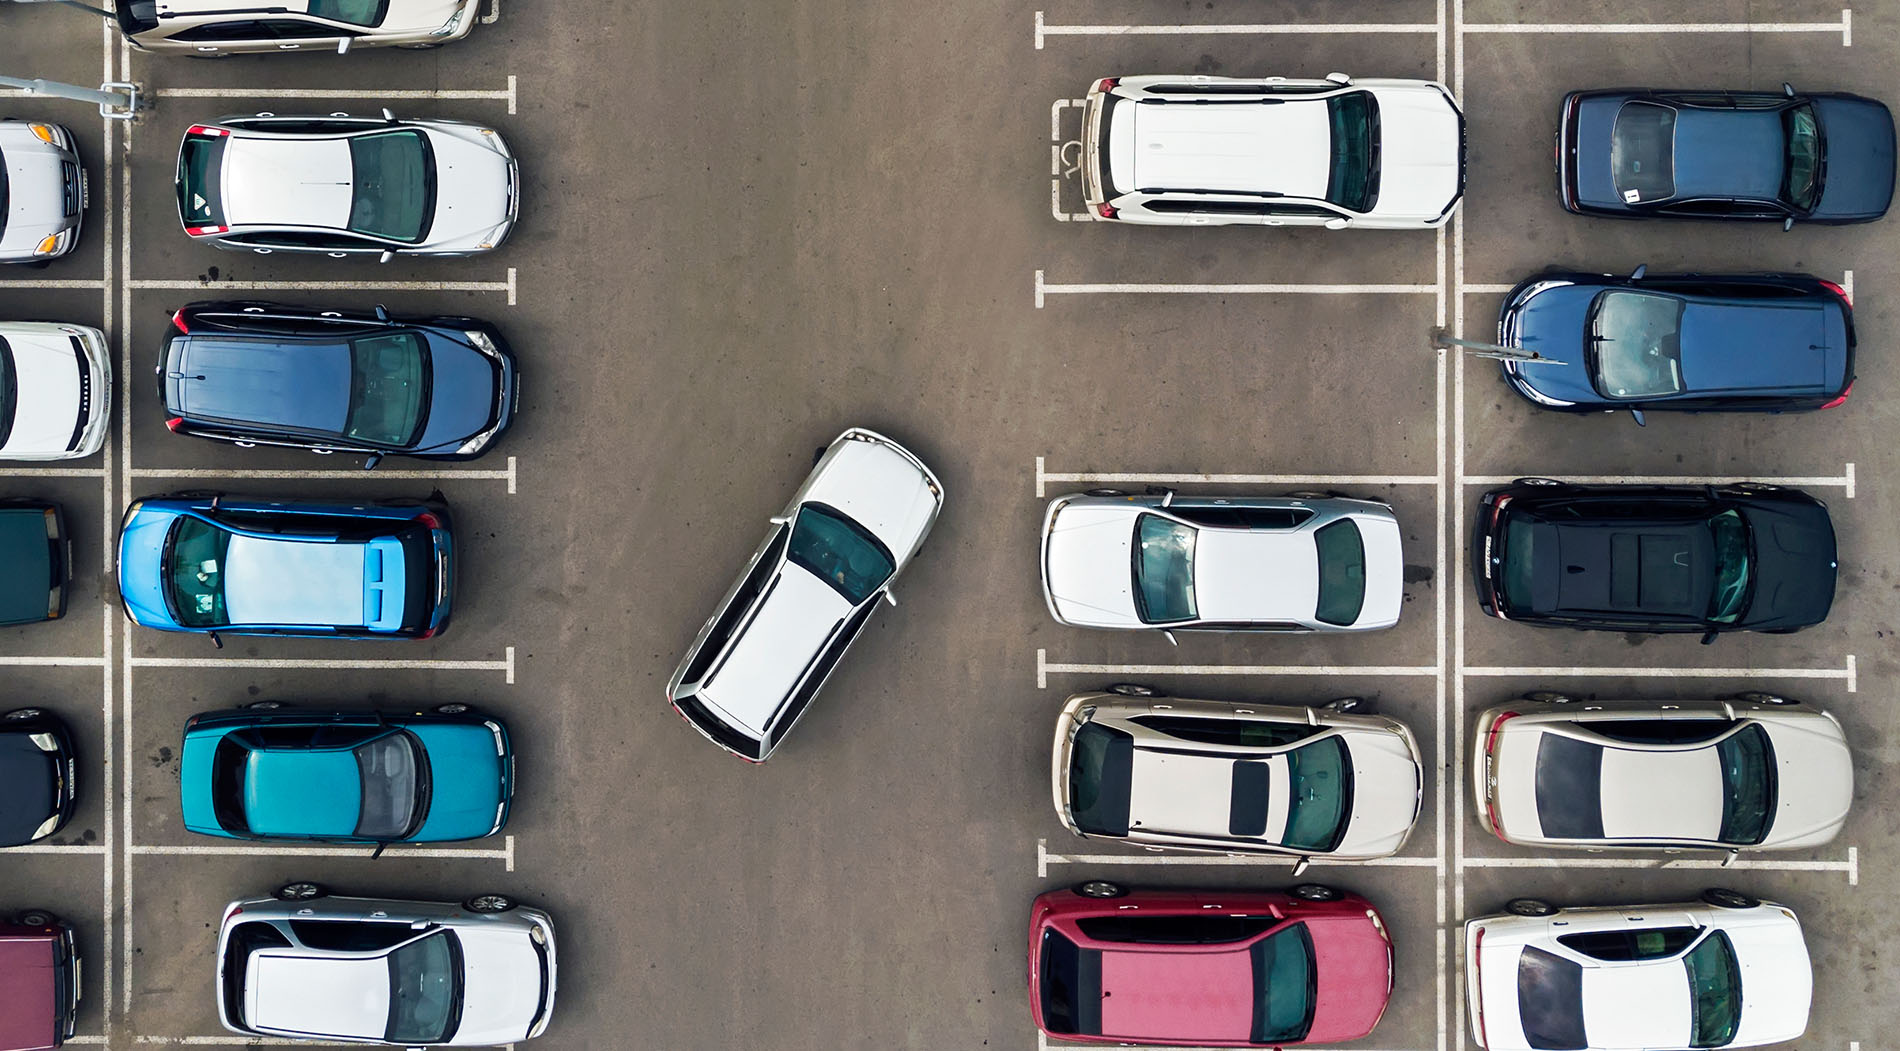 cinesi mobilitat aparcament